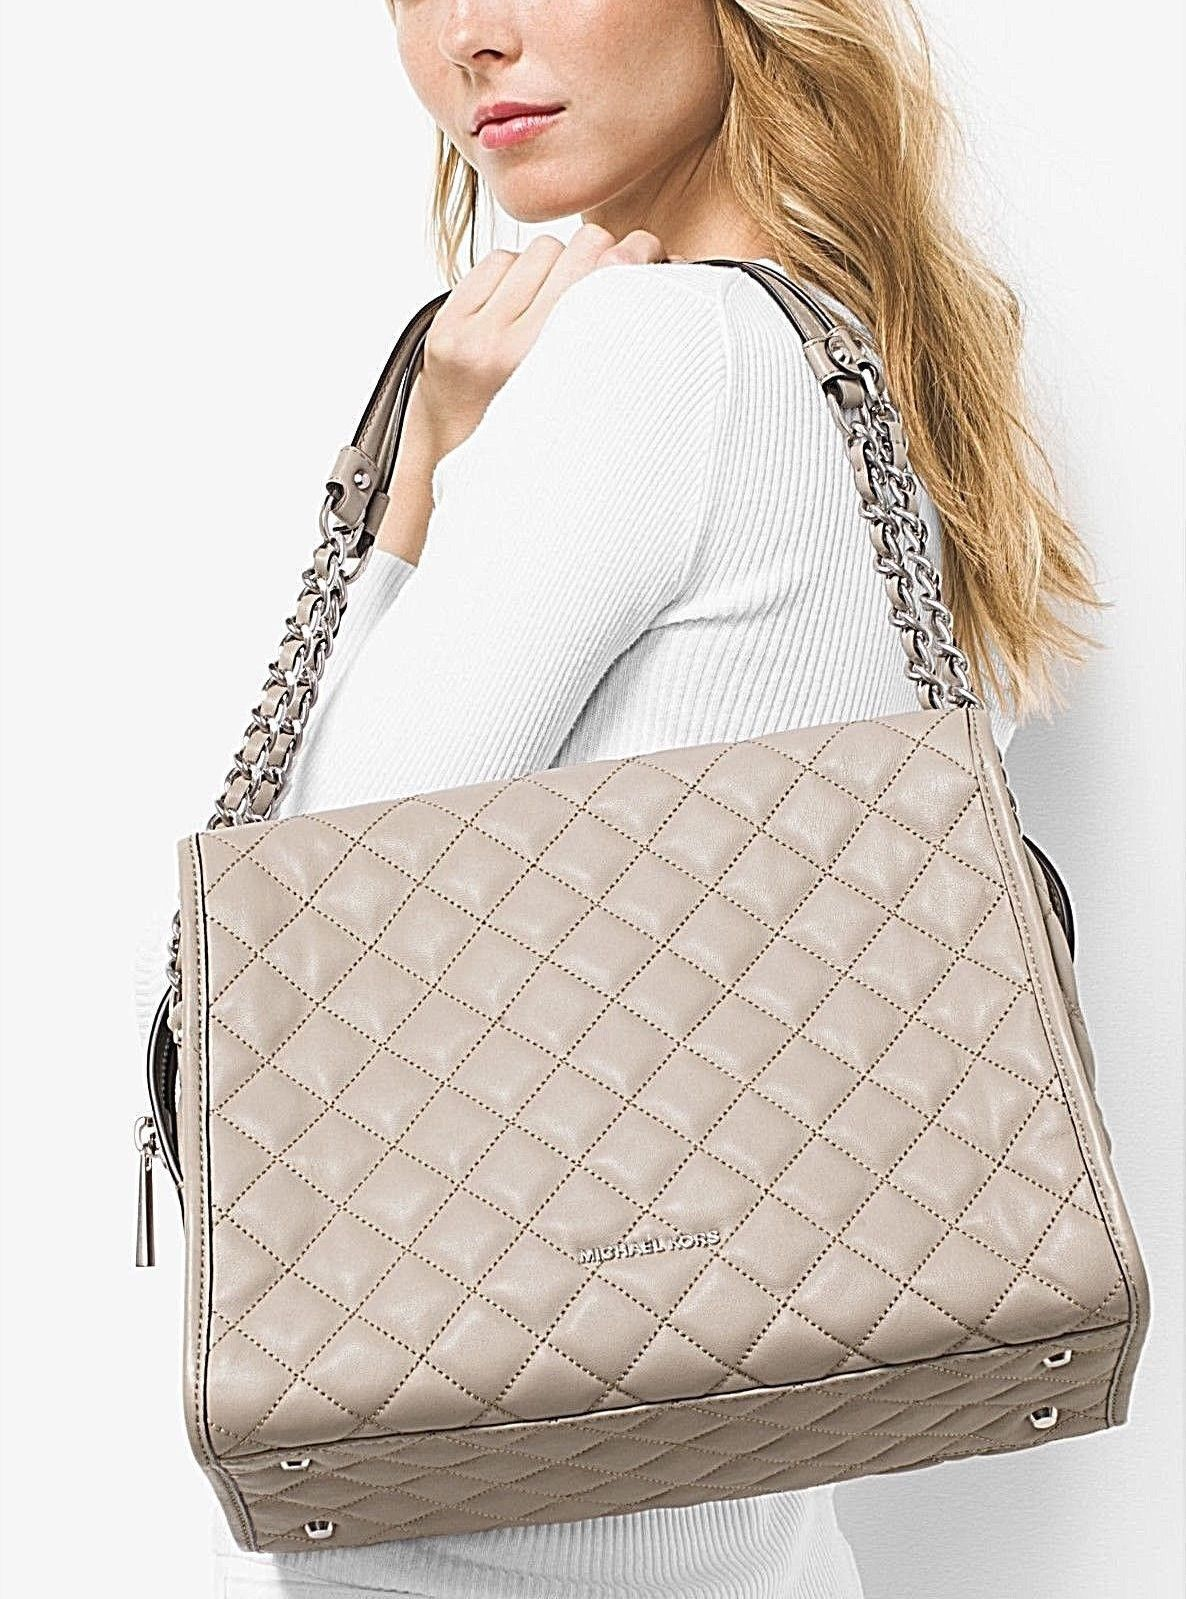 71f8d26a125bce Mk Rachel Large Cement Quilted Leather Shoulder Bag | bag it | Bags ...